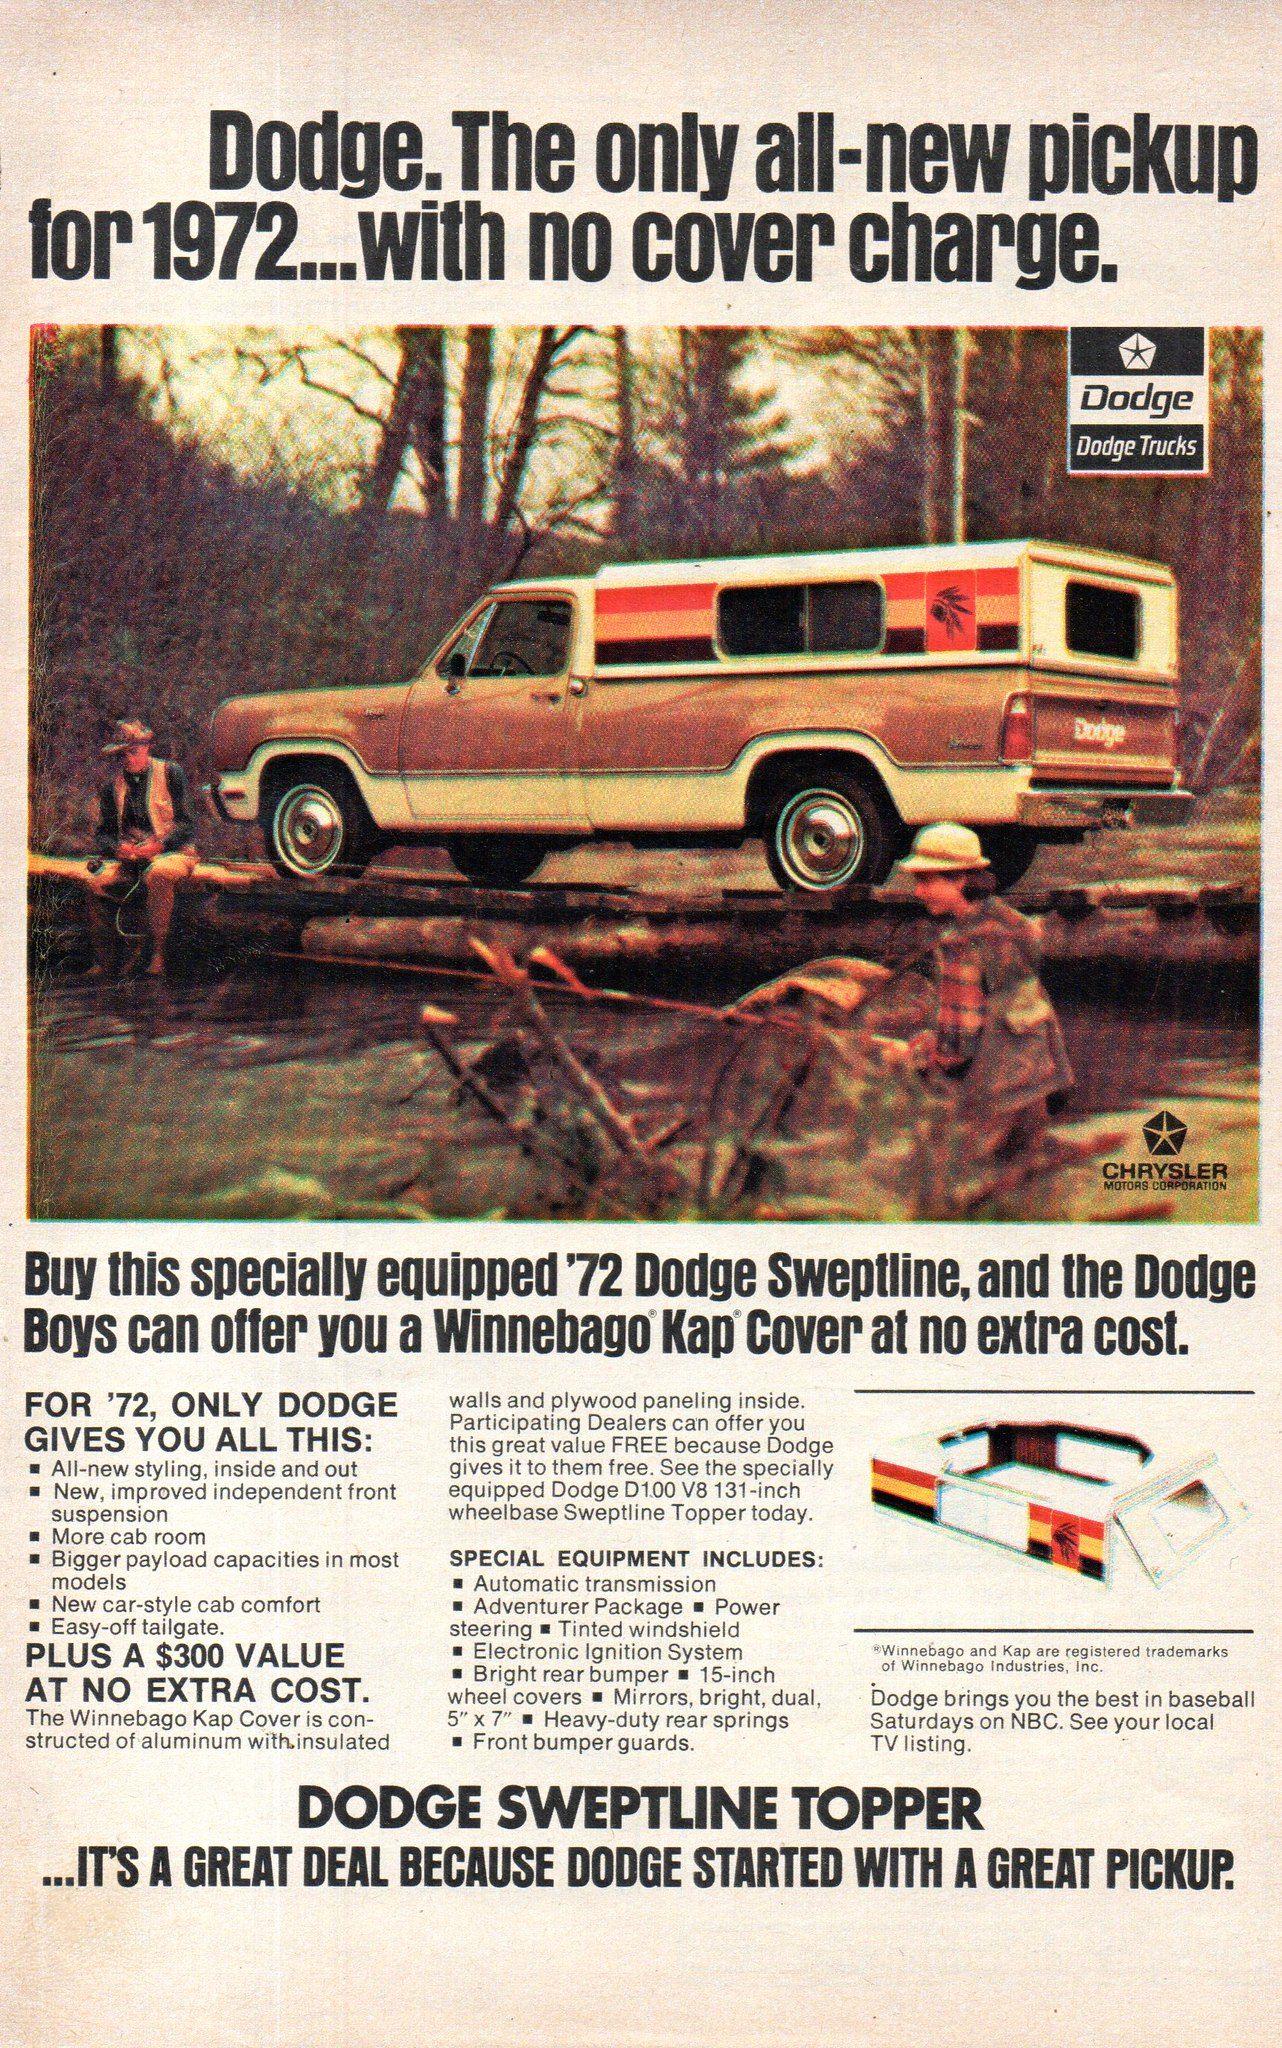 1972 Dodge Sweptline Topper Pickup Truck Chrysler Corporation Usa Original Magazine Advertisement Dodge Pickup Trucks Vintage Trucks